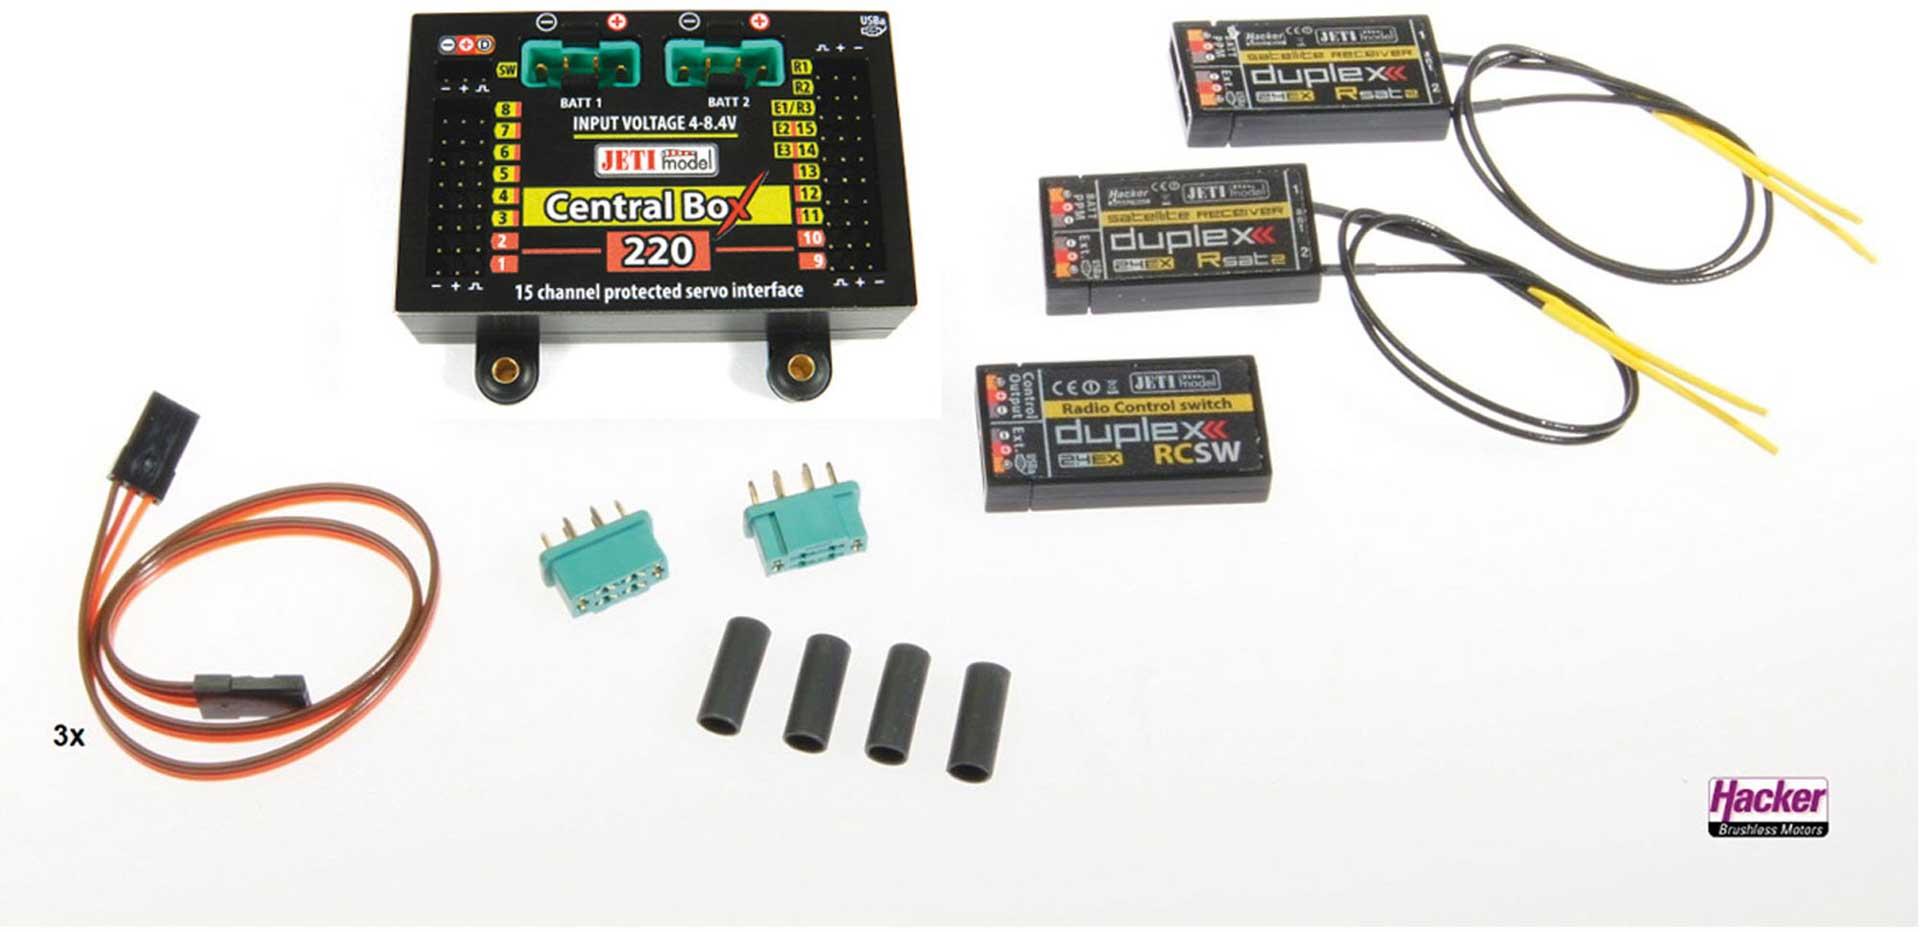 JETI DUPLEX 2.4EX CENTRAL BOX 220 + 2 RSAT2 + RC-SWITCH